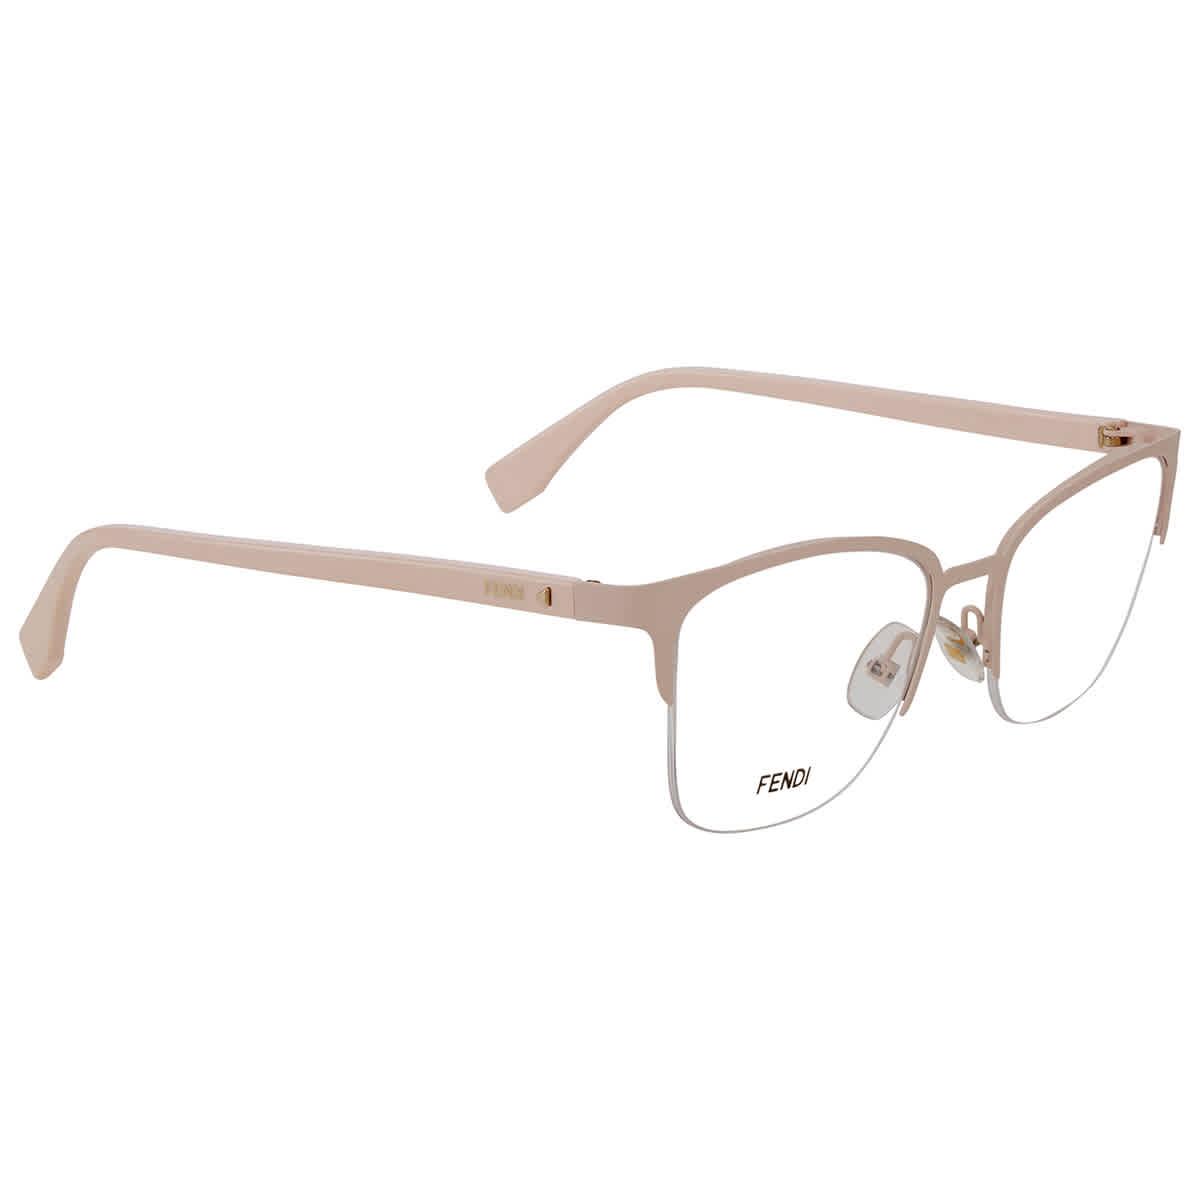 Fendi Demo Rectangular Ladies Eyeglasses Ff 0321 08kj 00 52/18 In Pink